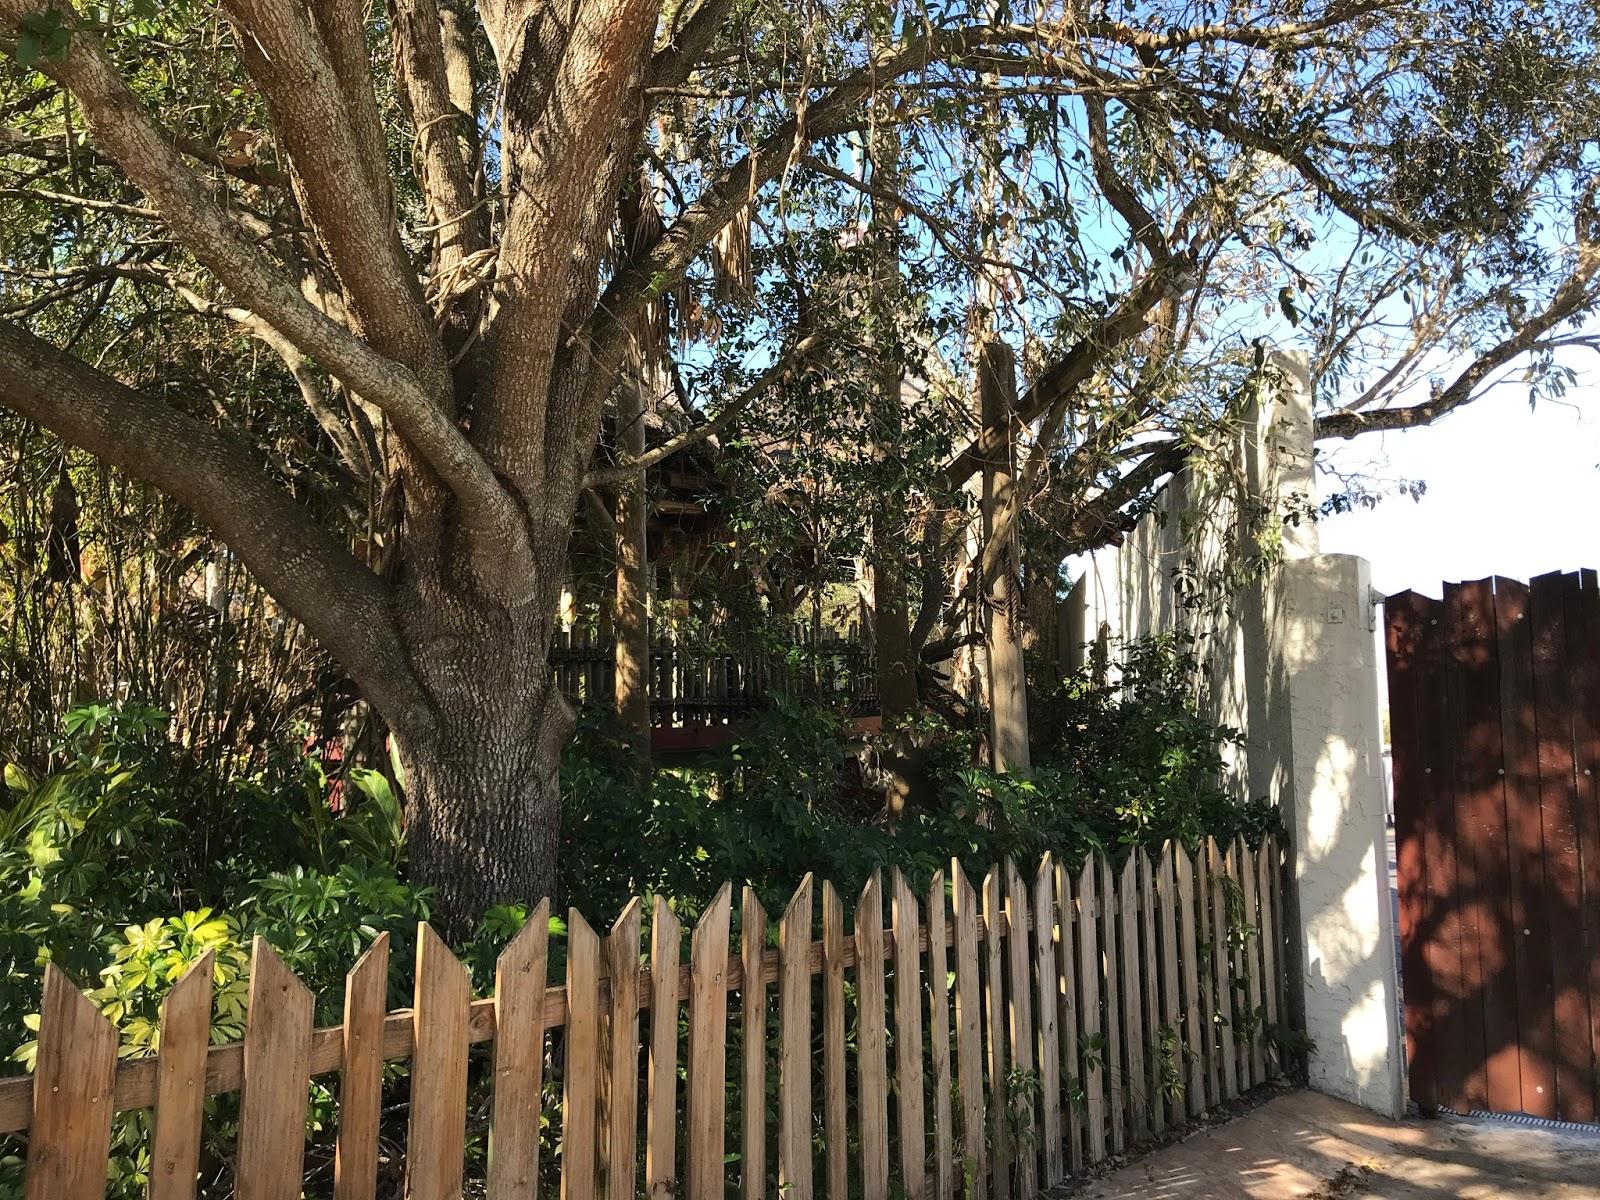 Gwazi- Busch Gardens Tampa